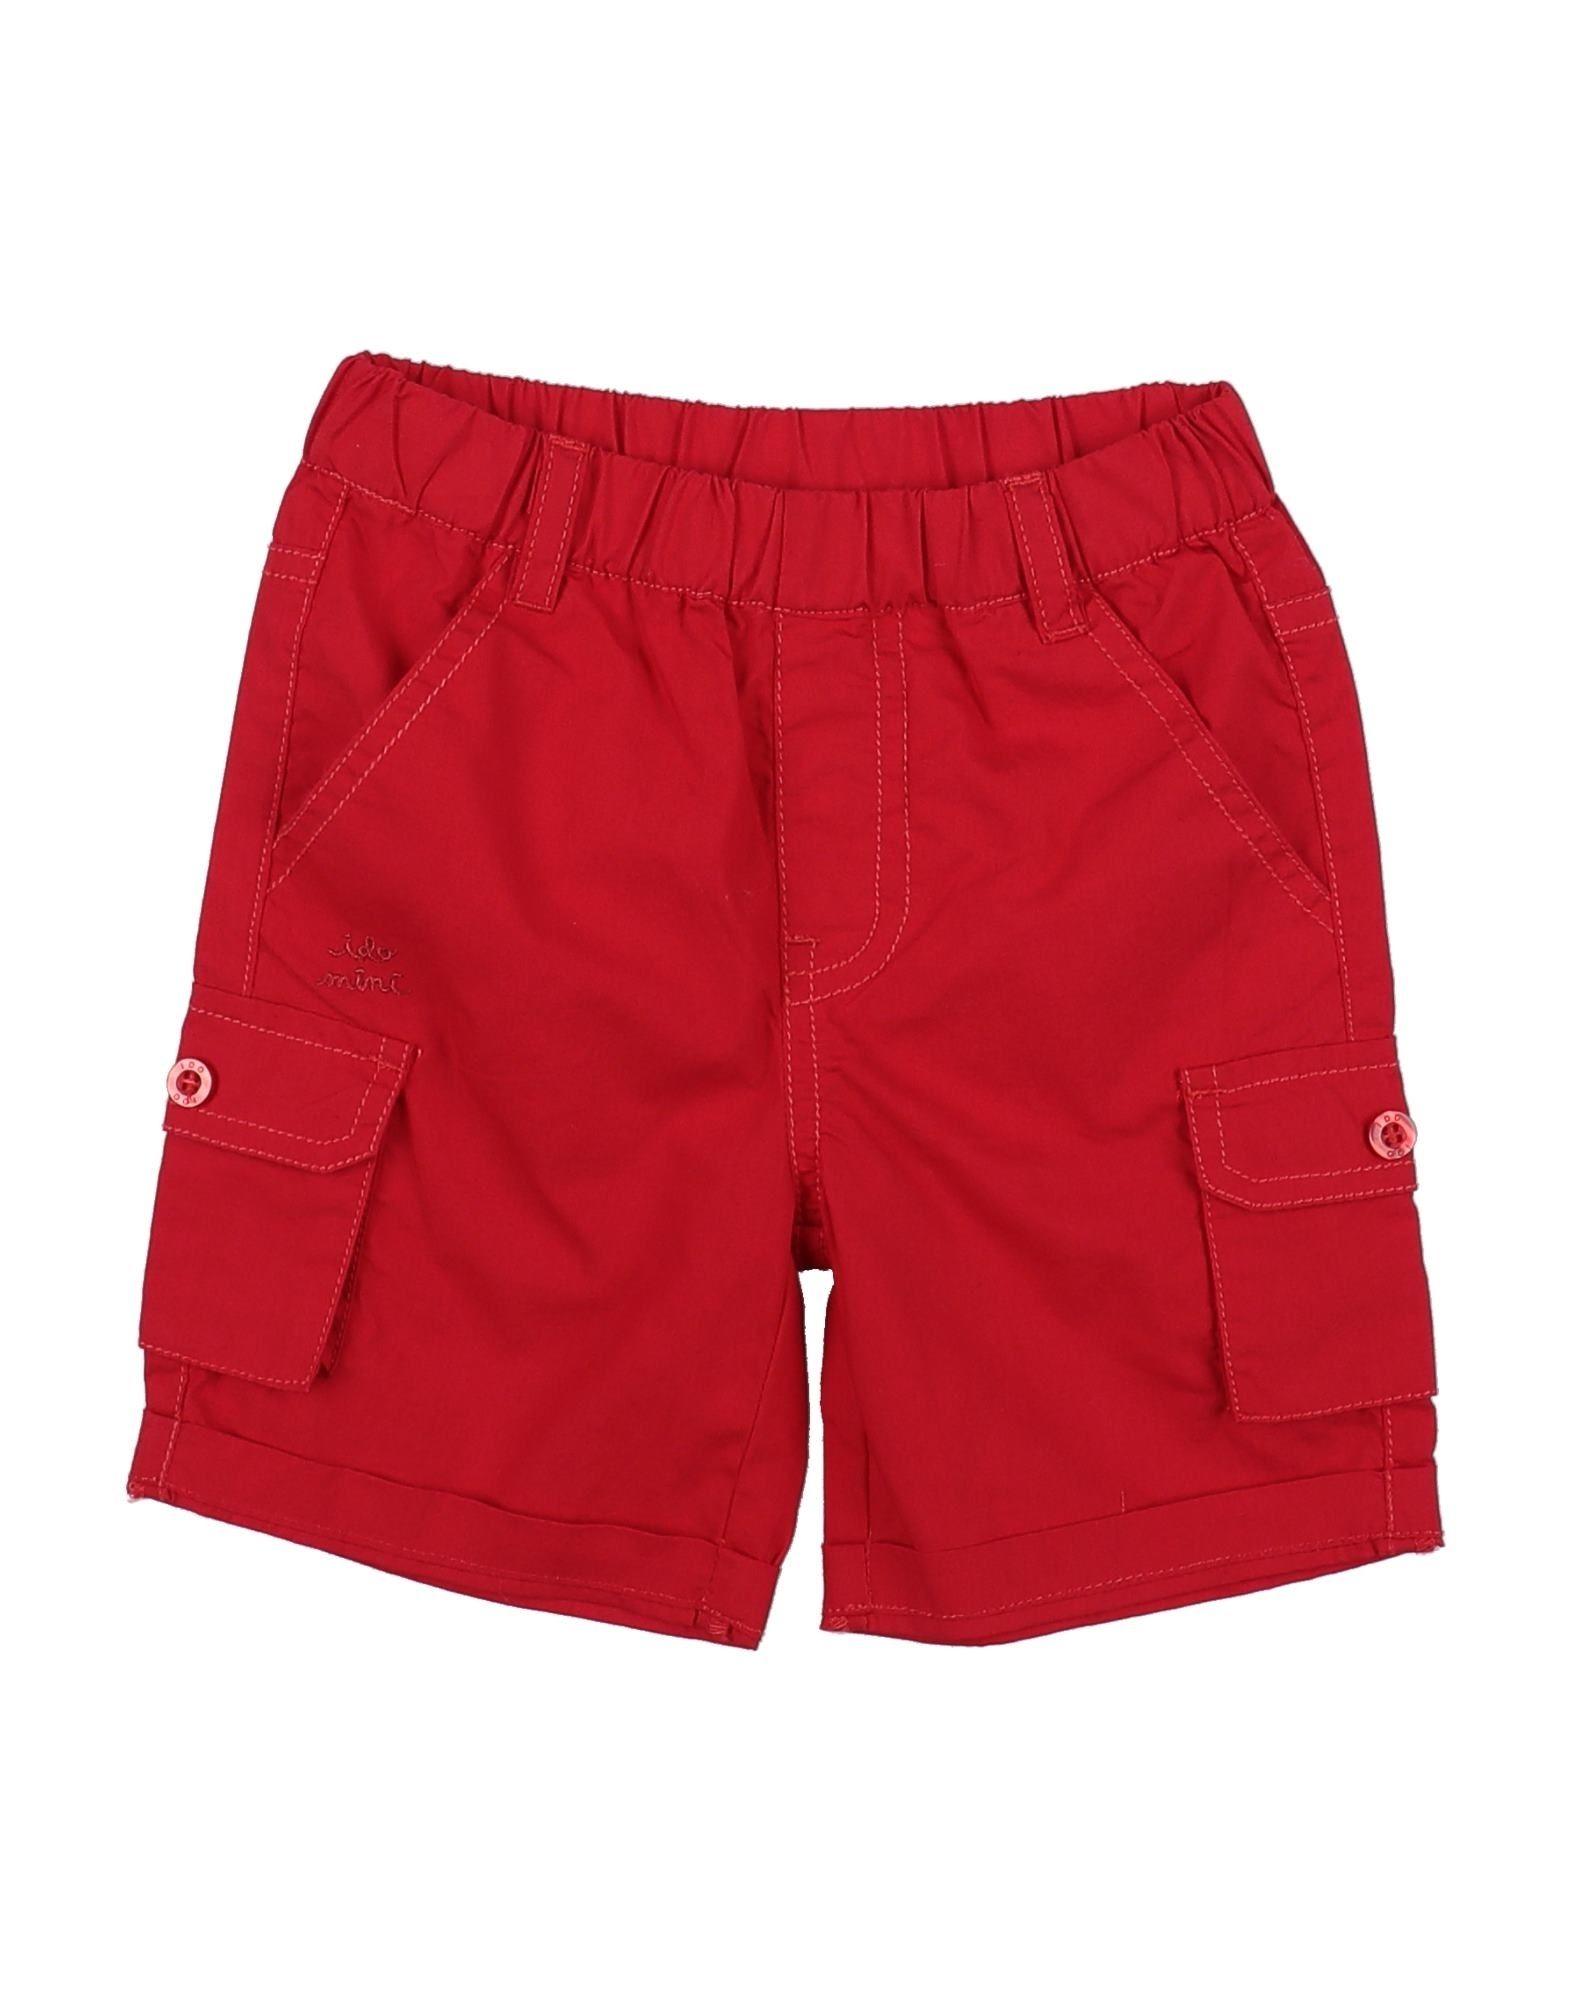 Ido By Miniconf Kids' Bermudas In Red